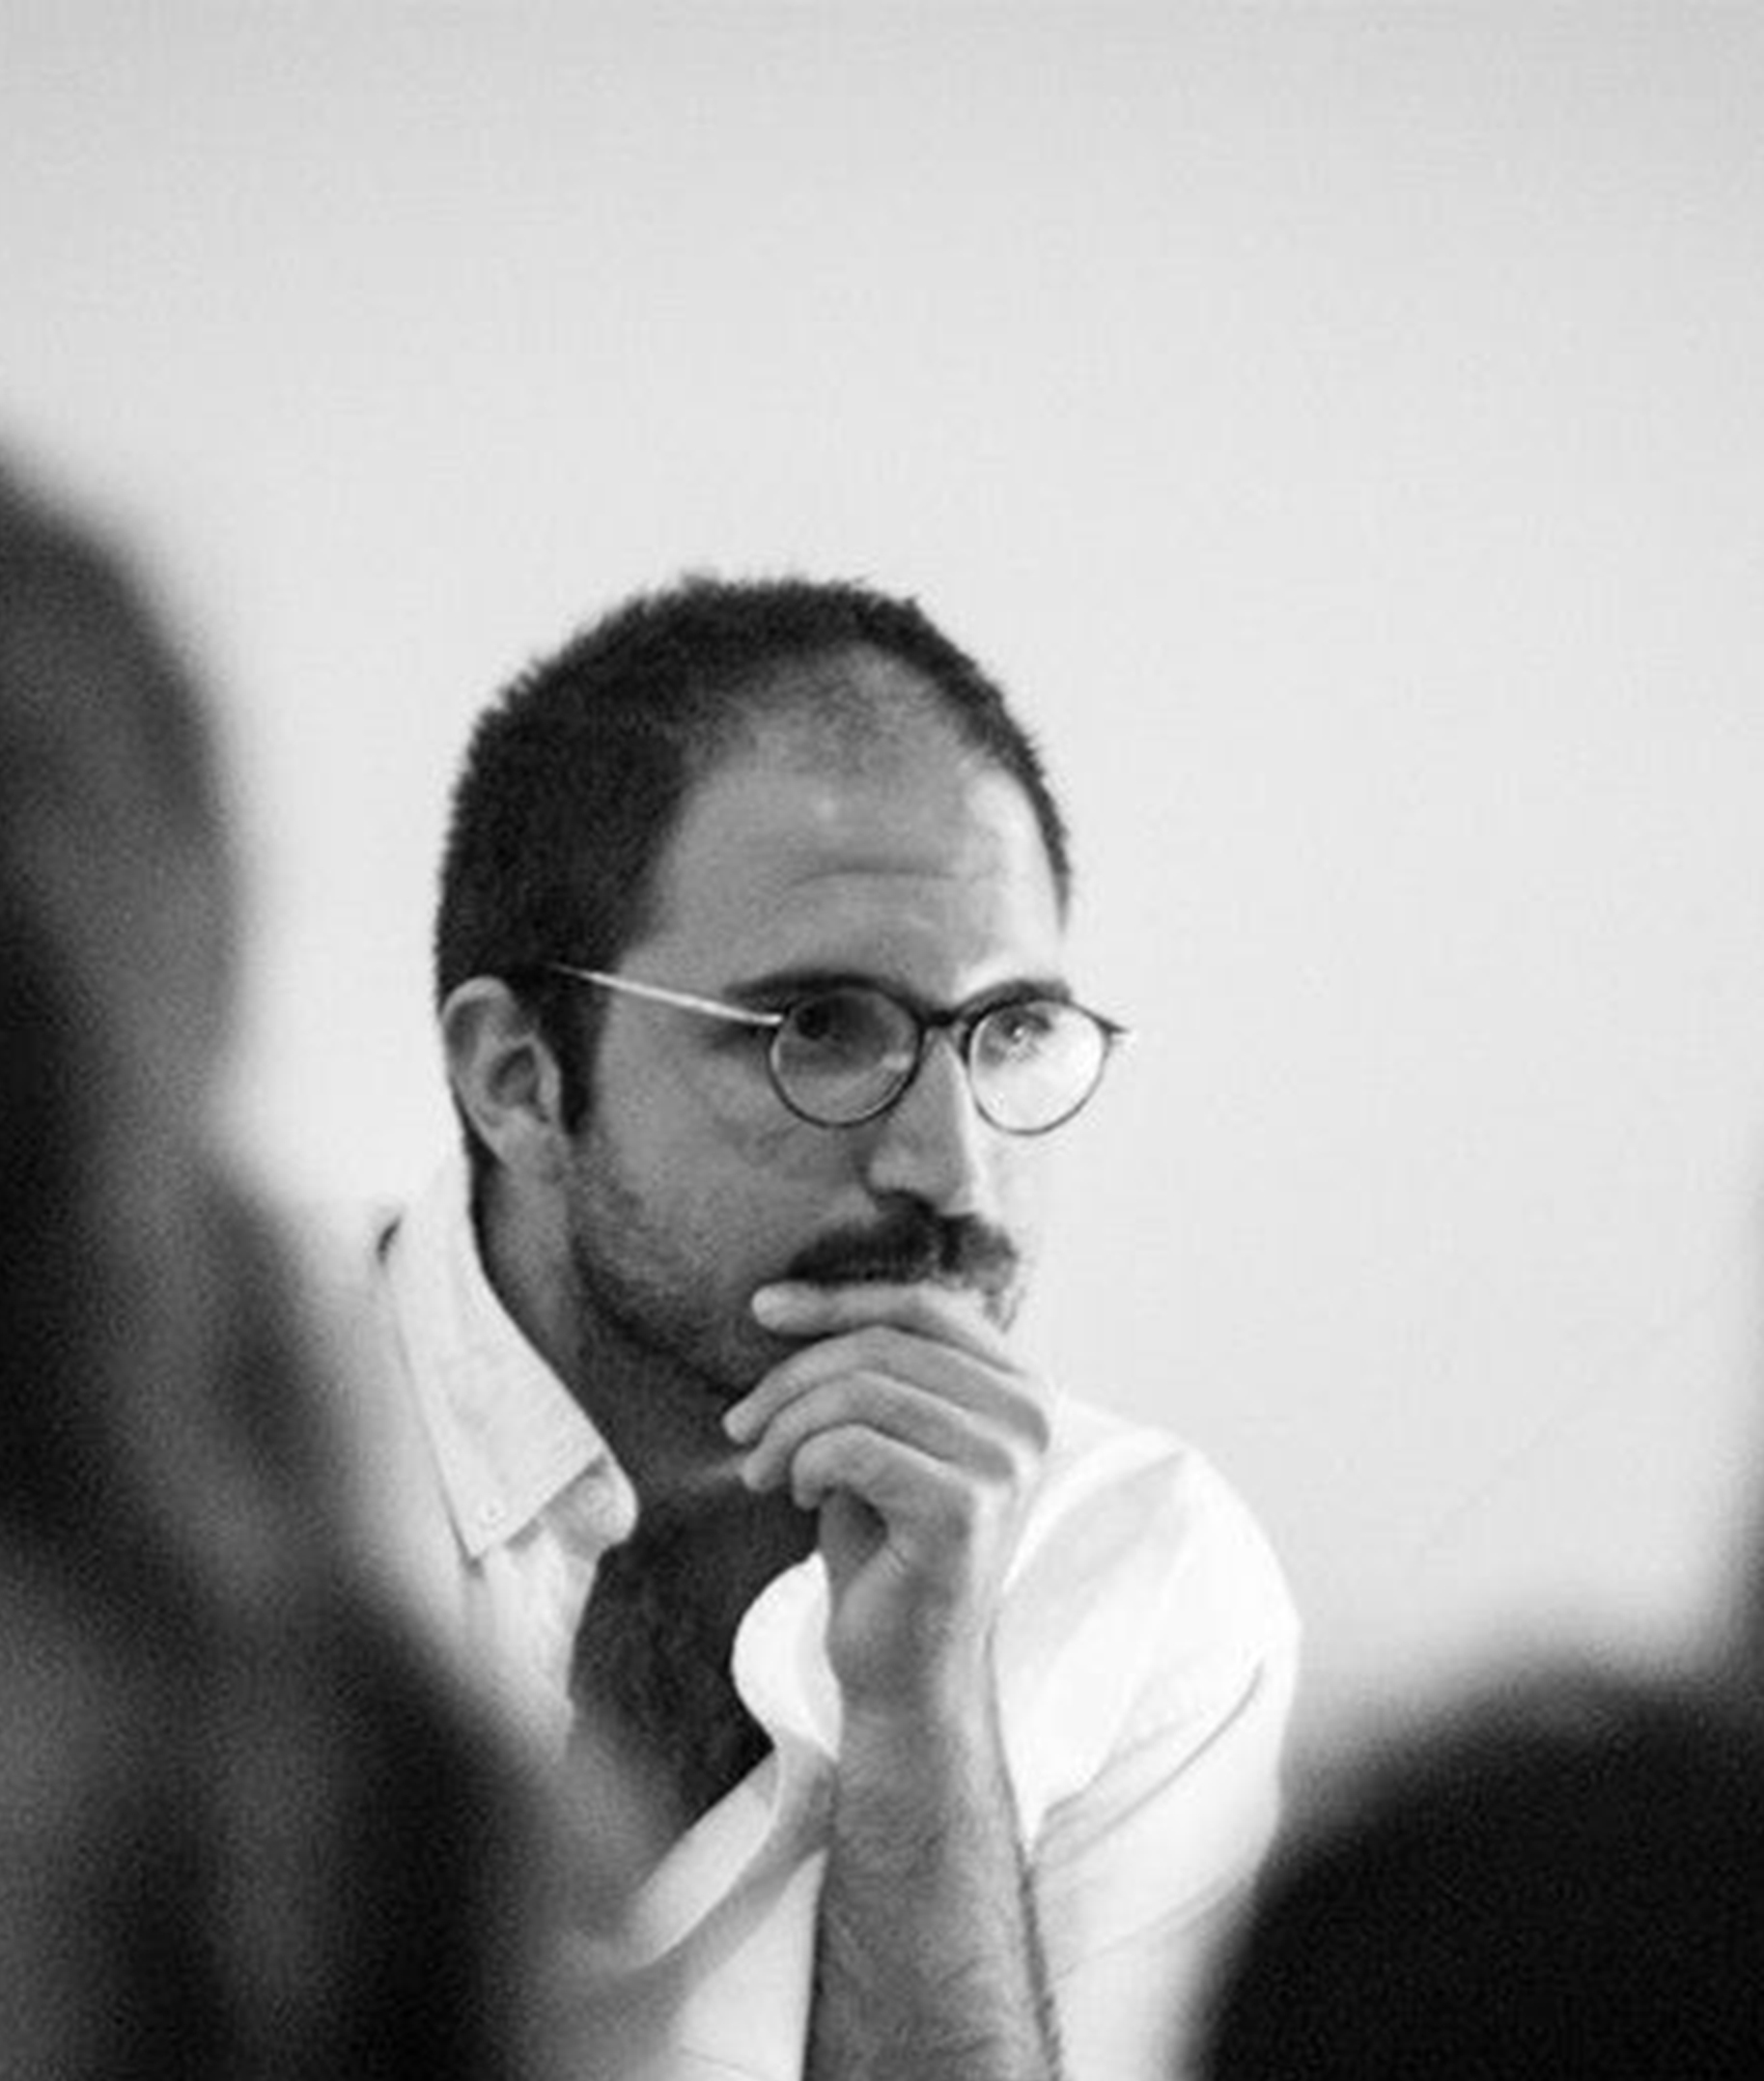 Raafat Majzoub portrait headshot.jpg